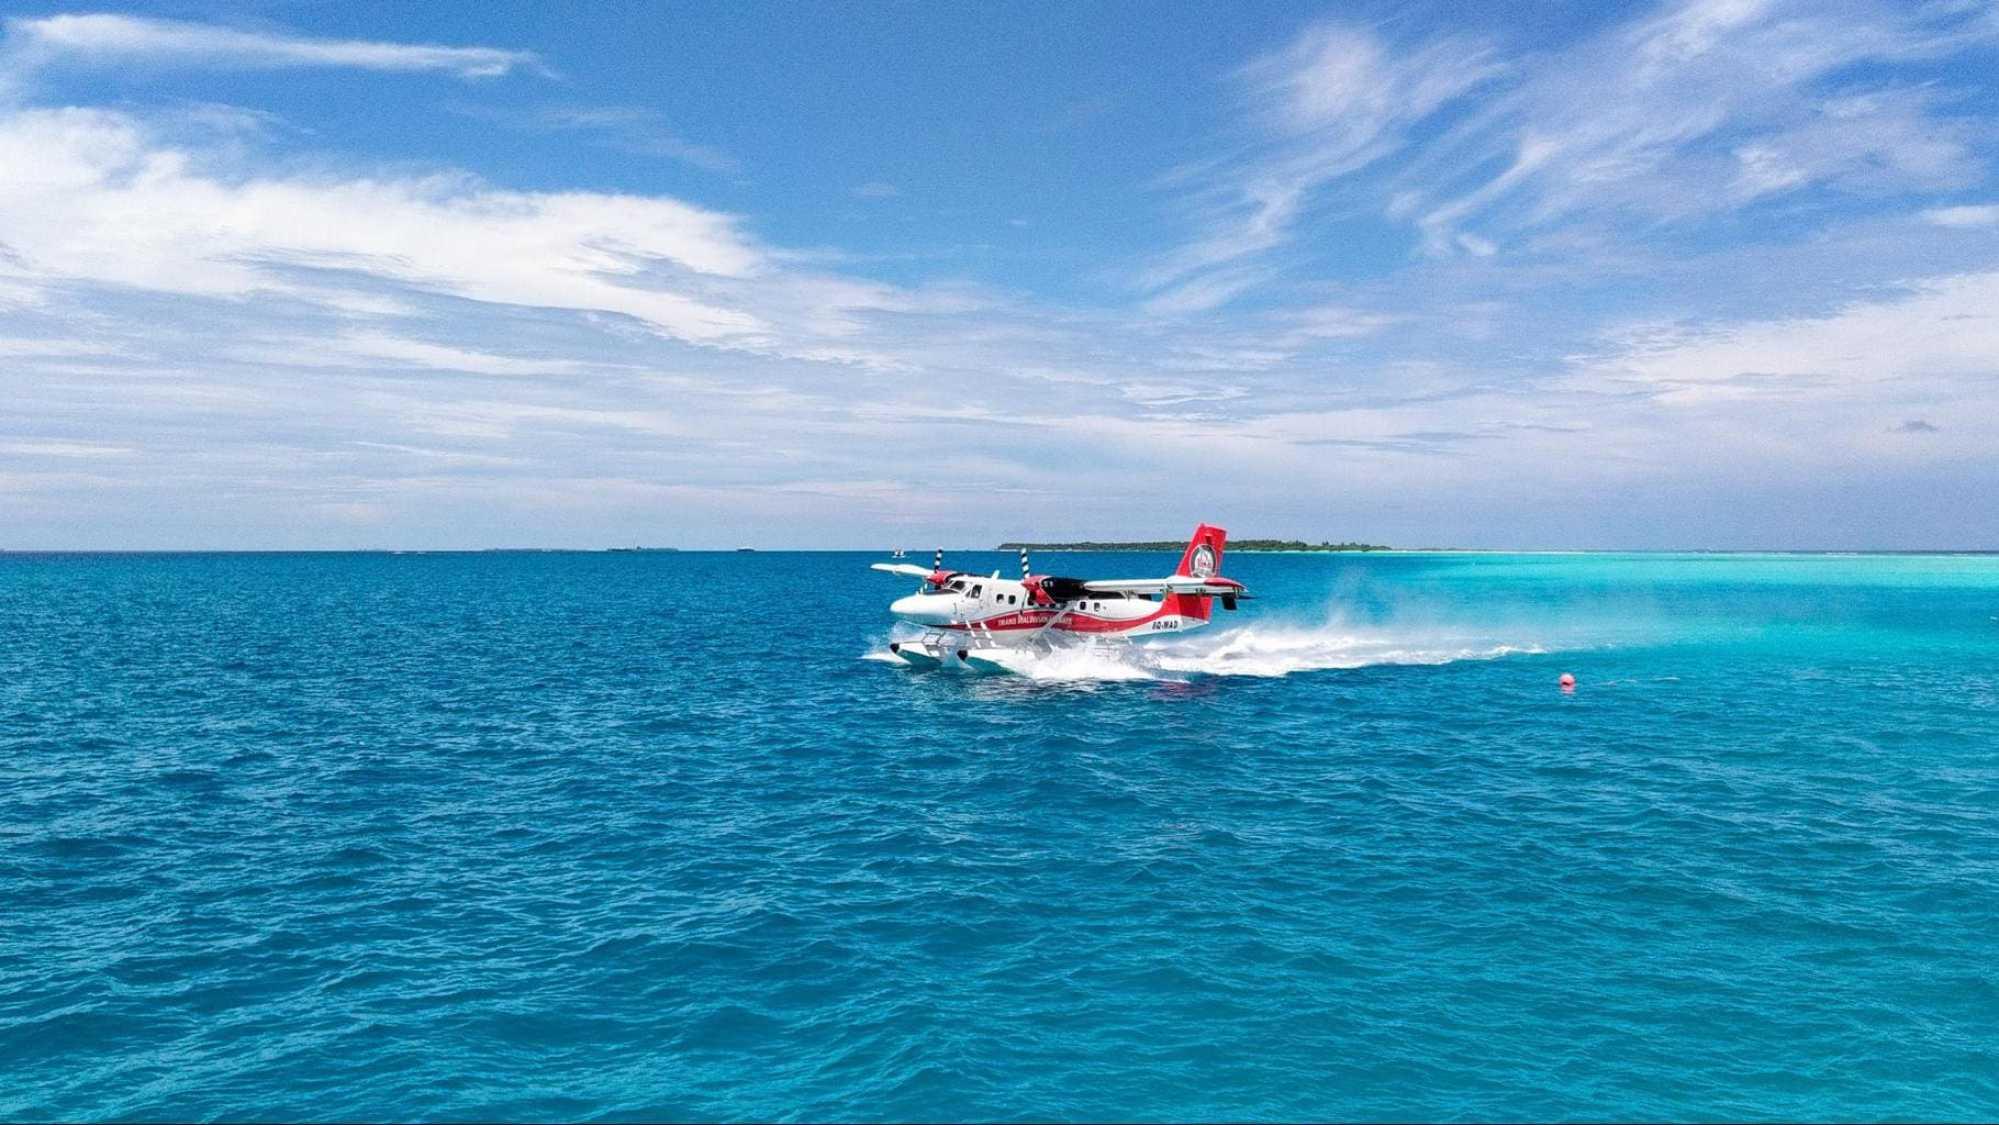 Landing on a seaplane At LUX* Maldives